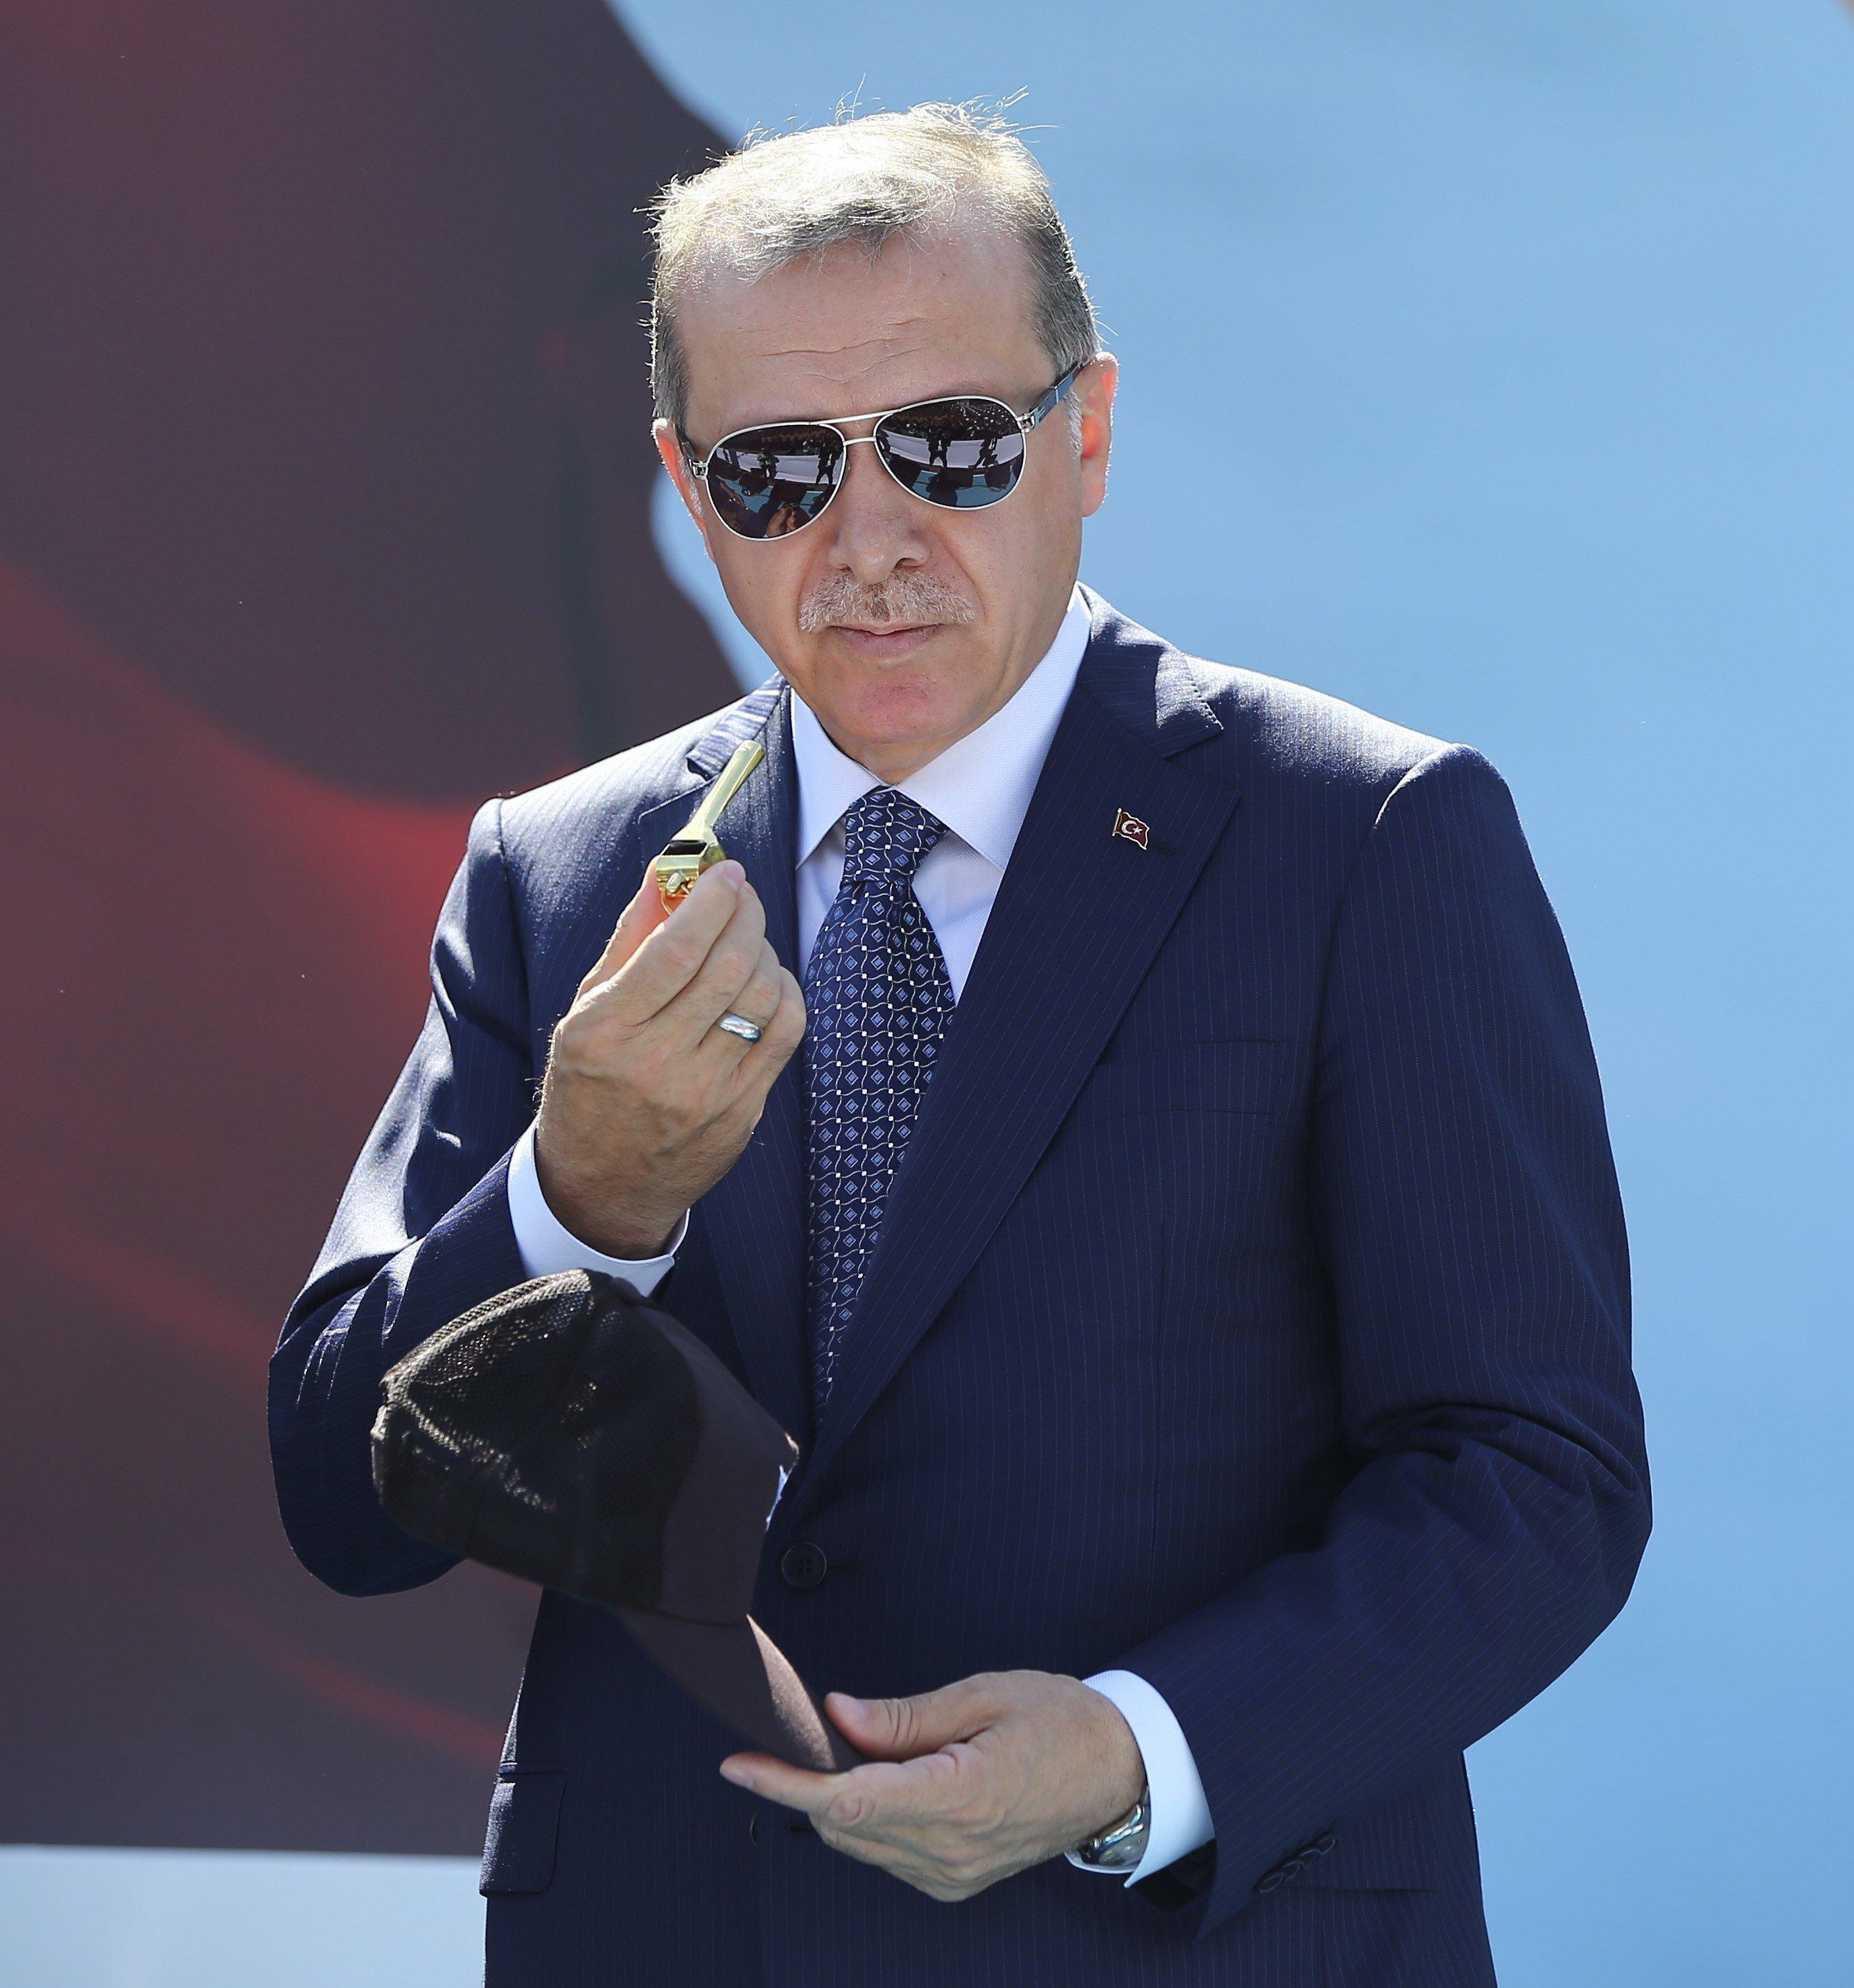 Erdogans Schattenarmee: Europäische Medien enthüllen brutales